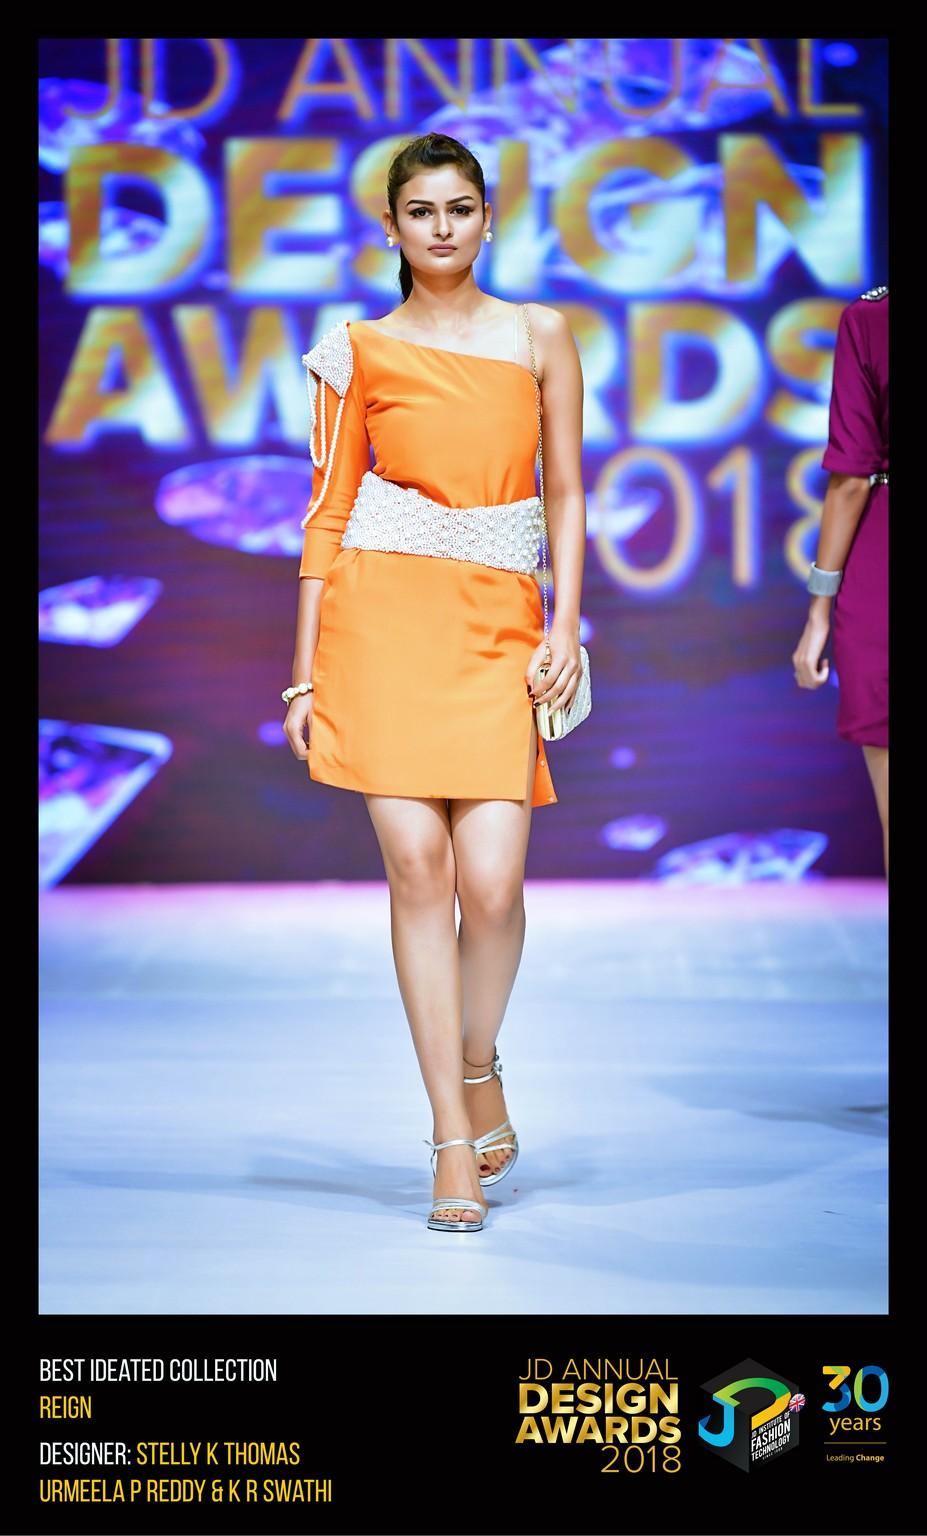 Reign – Change – JD Annual Design Awards 2018 | Designer: Swathi, Stelly and Urmeela | Photography : Jerin Nath (@jerin_nath) reign - 18 06 2018 REIGN Photos JDW FB2 - Reign – Change – JD Annual Design Awards 2018